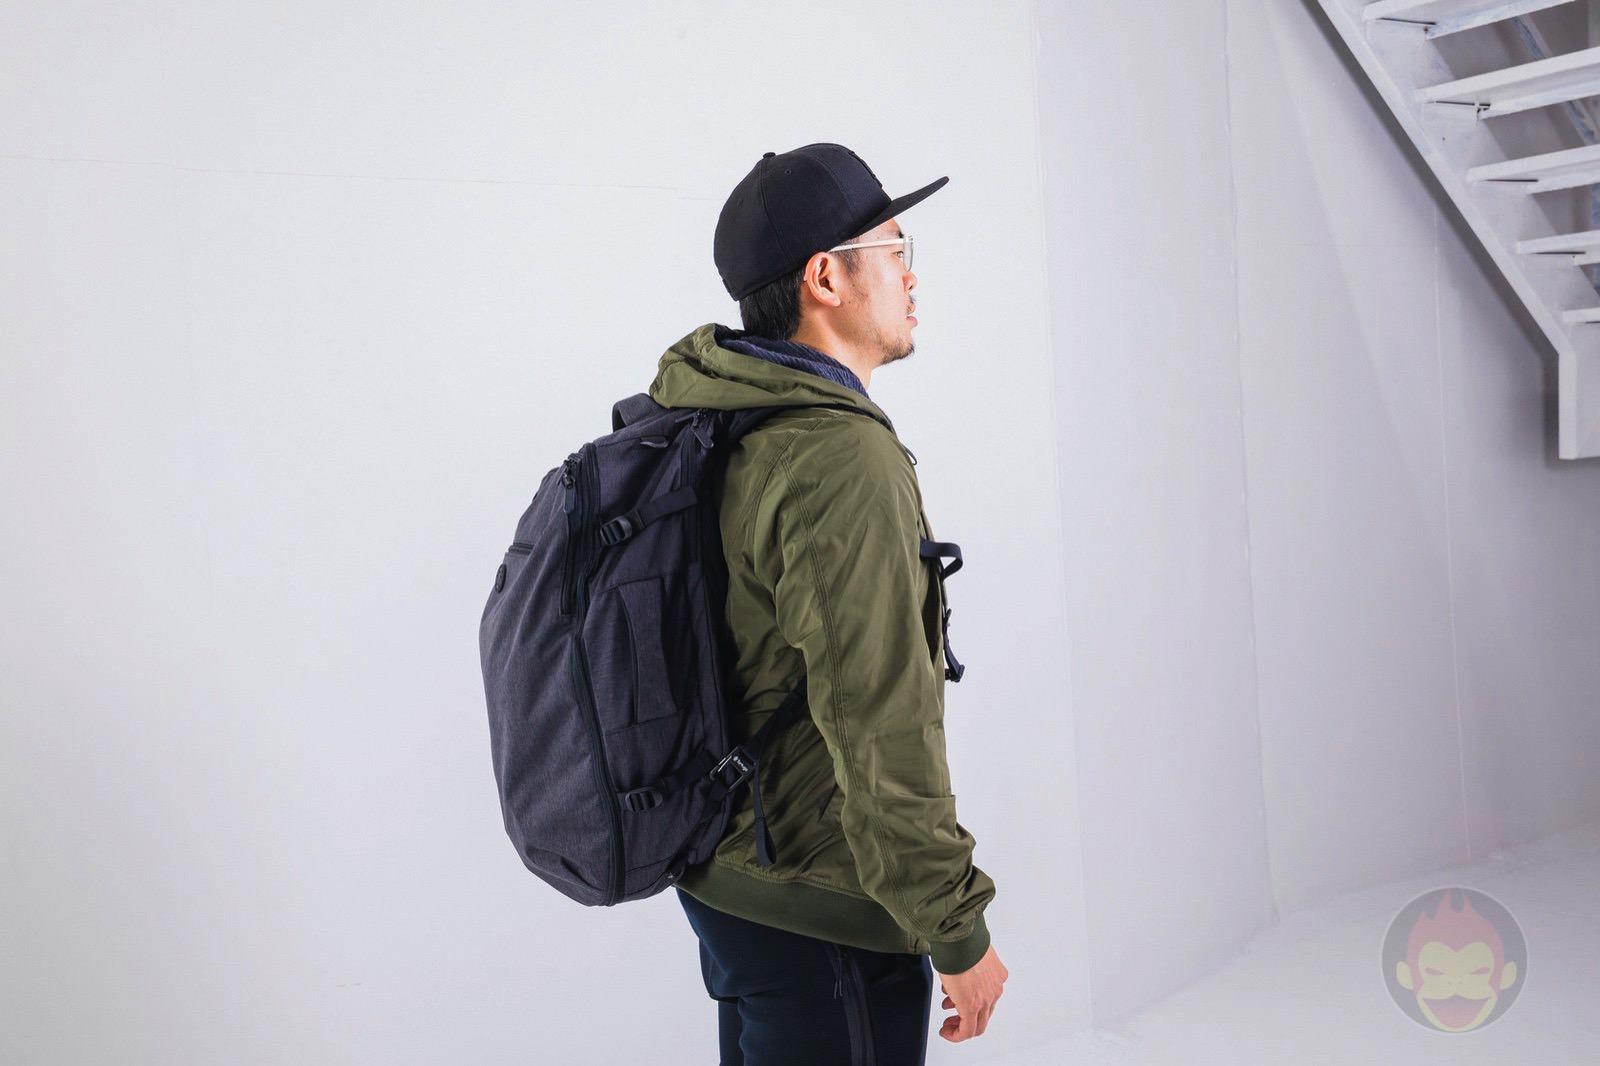 Tortuga-Setout-Backpack-35liter-review-44.jpg